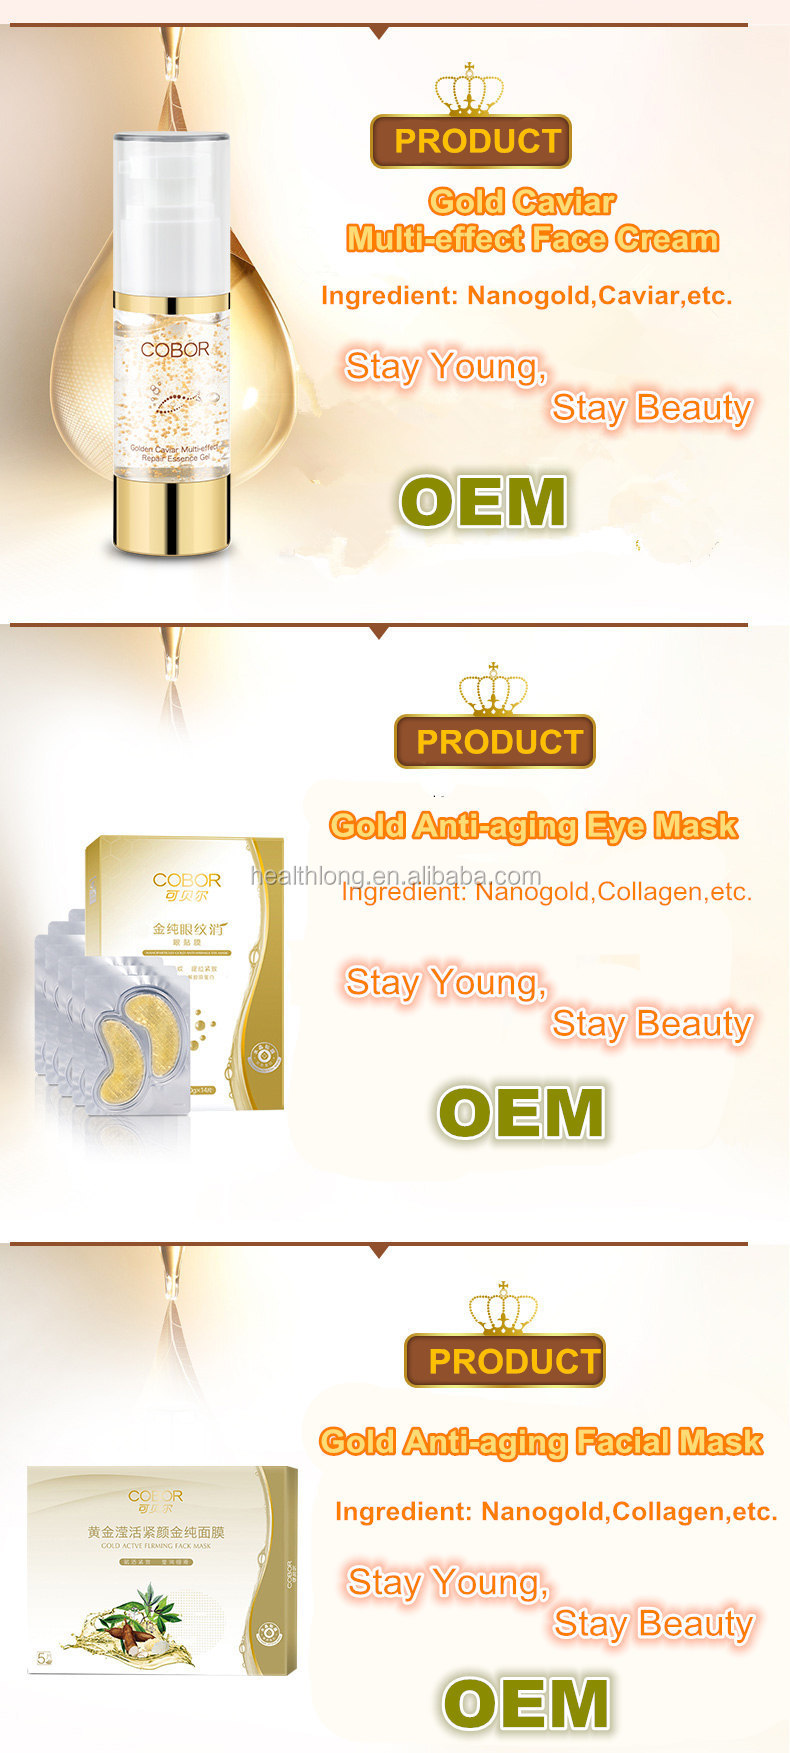 Products elderly care products elderly care products product on - Caviar Elderly Care Products Face Cream Skin Care Whitening Cream Set